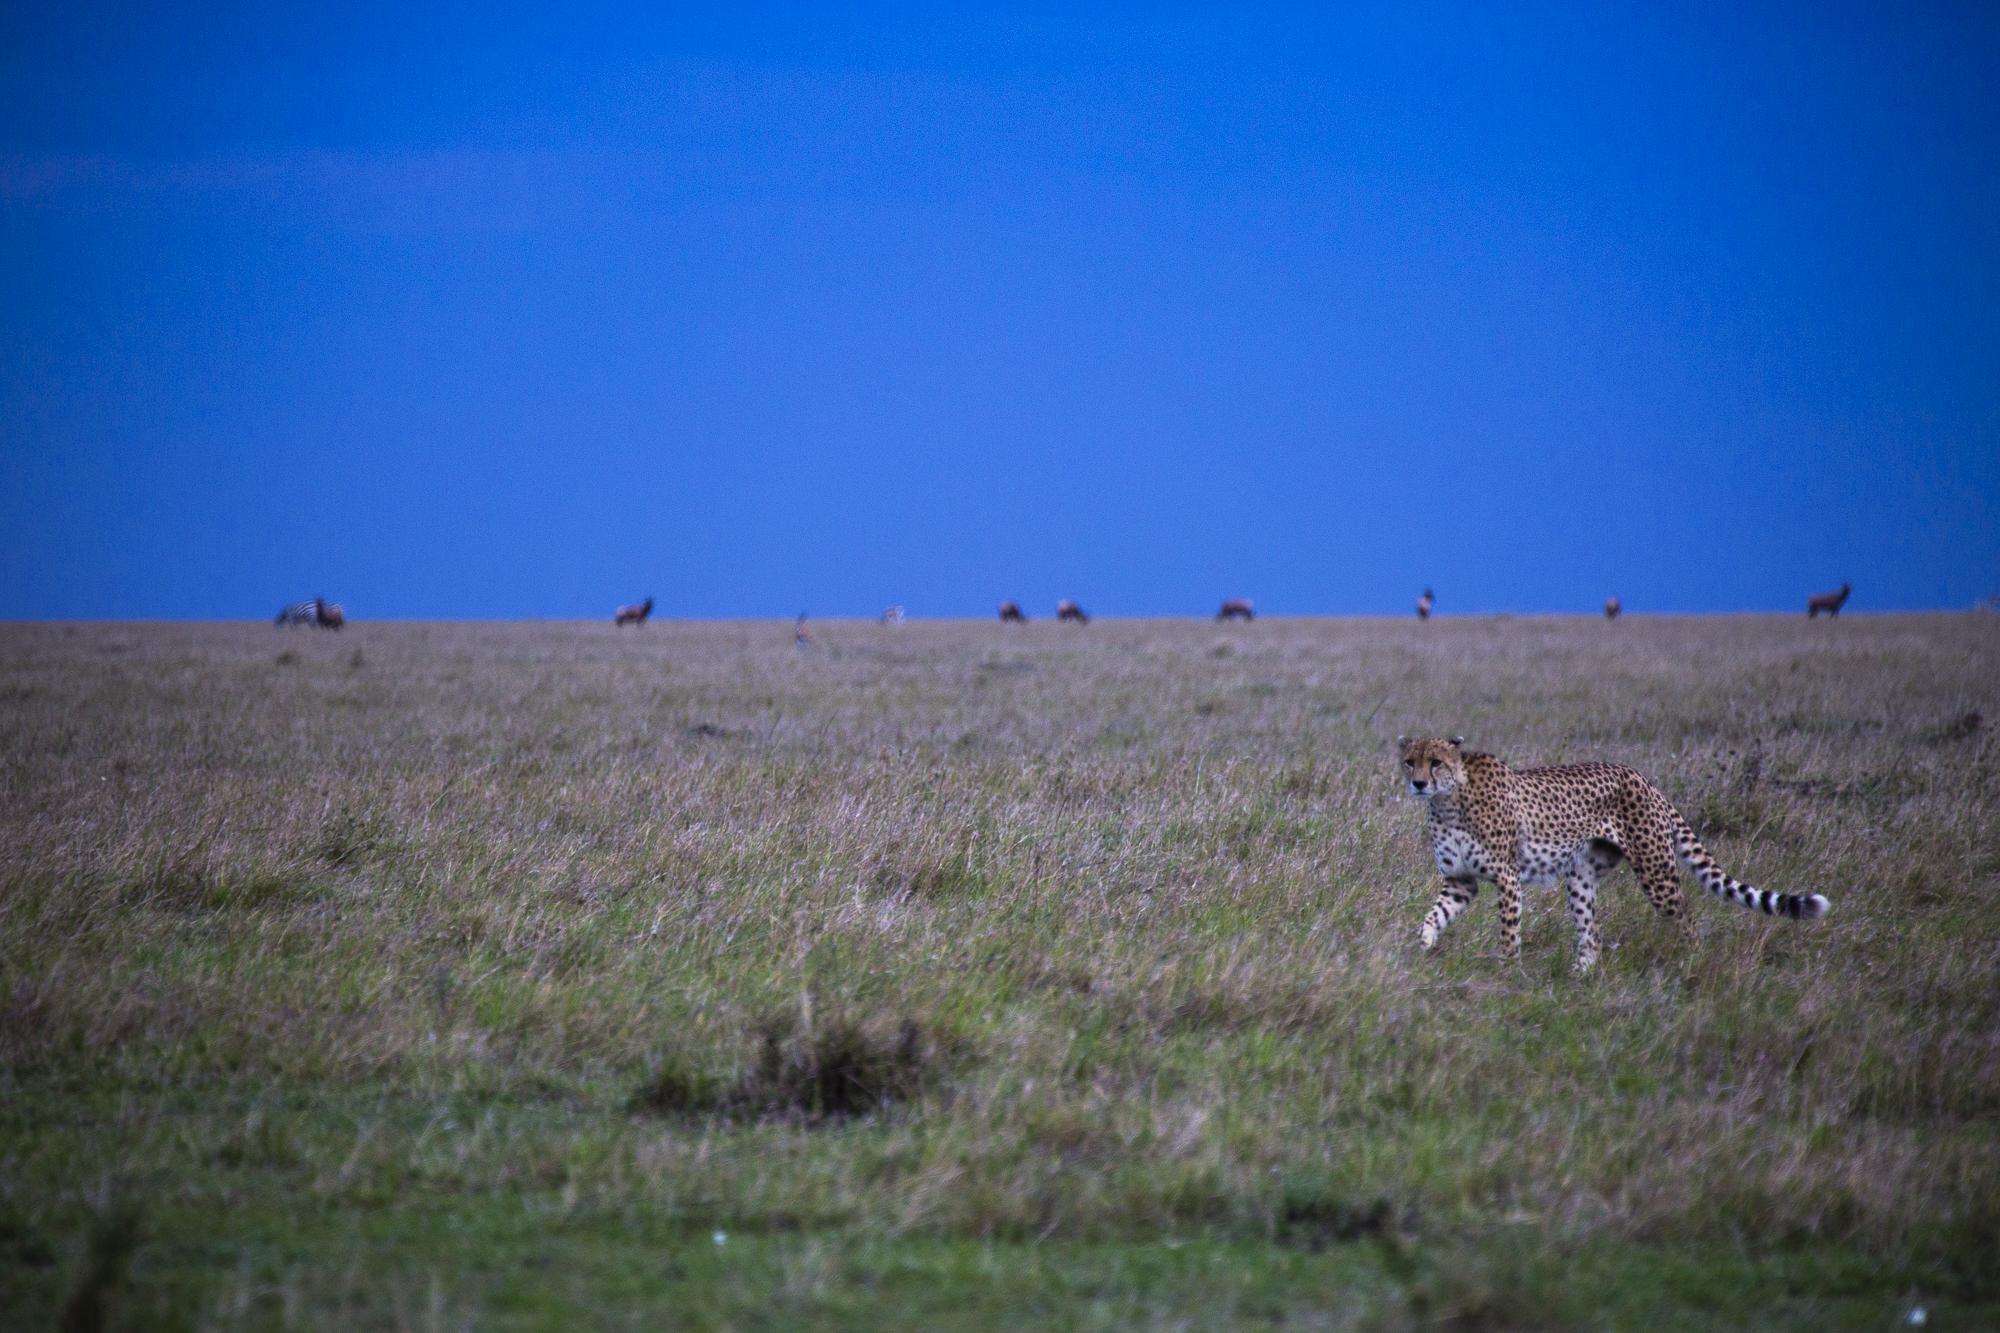 A cheetah walks through the African Savanna shortly after sunset in the Maasai Mara National Reserve in Kenya.